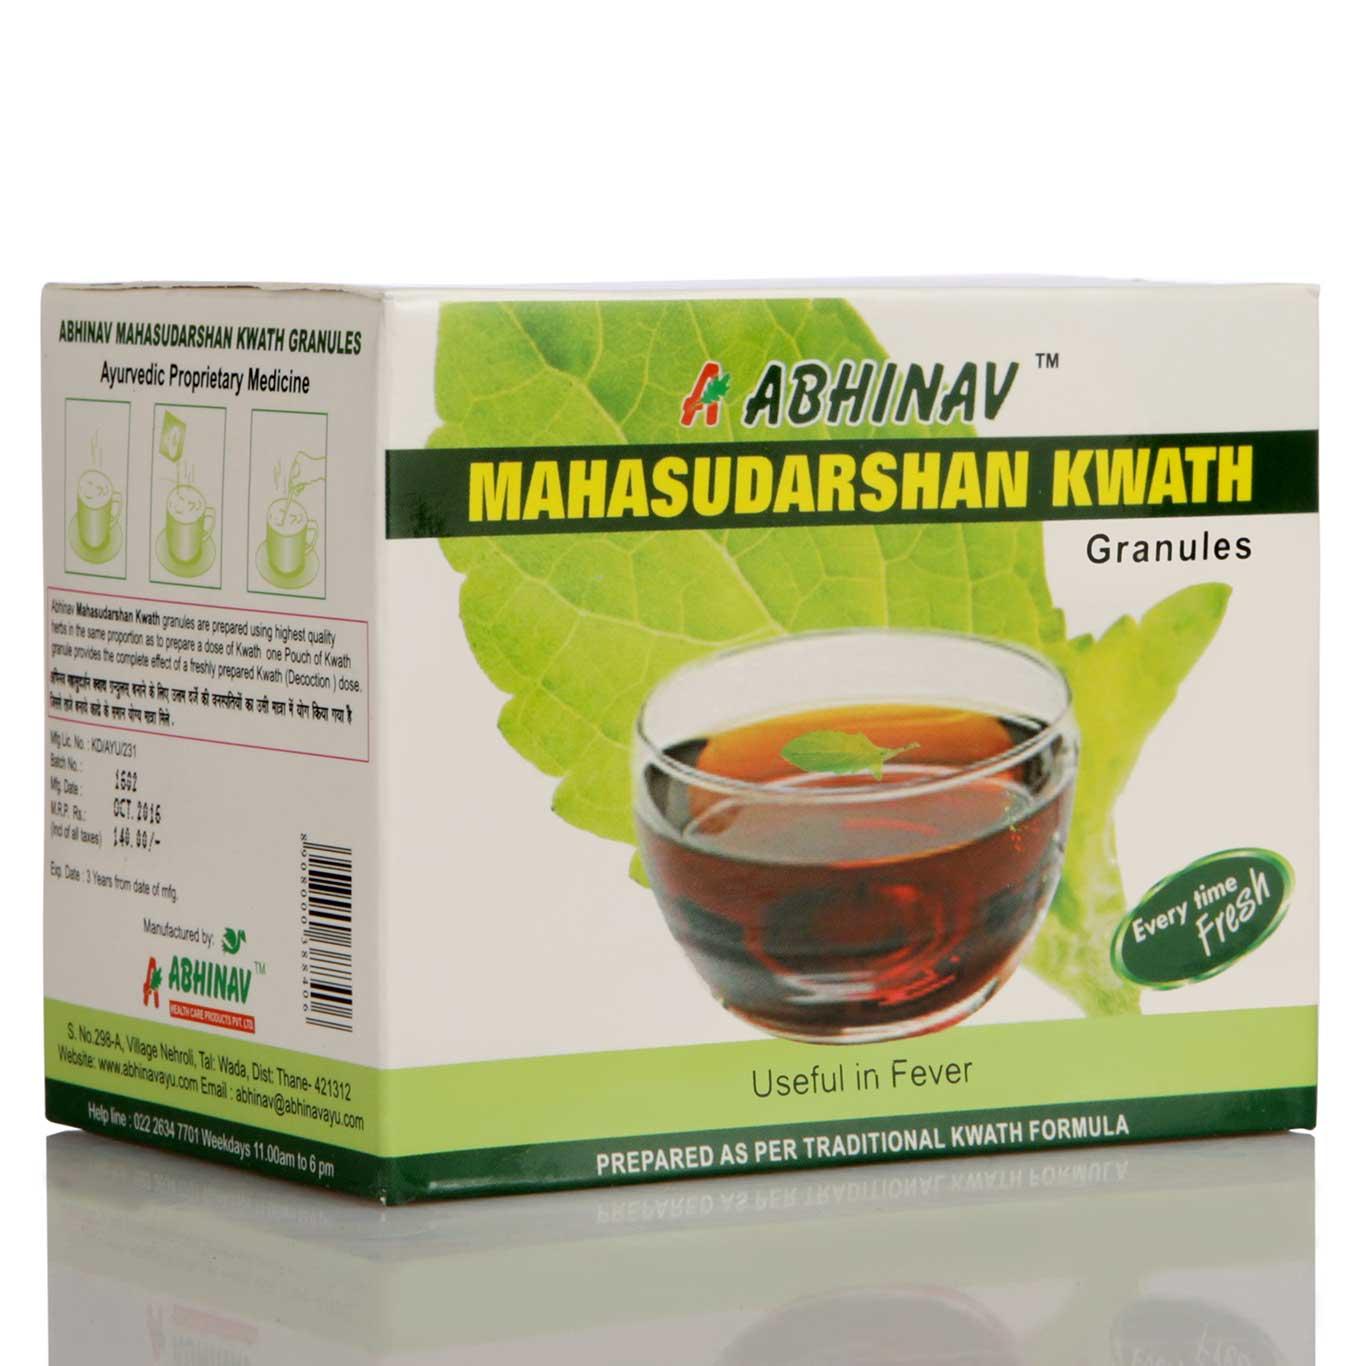 ayurvedic Mahasudarshan Kwath Granules